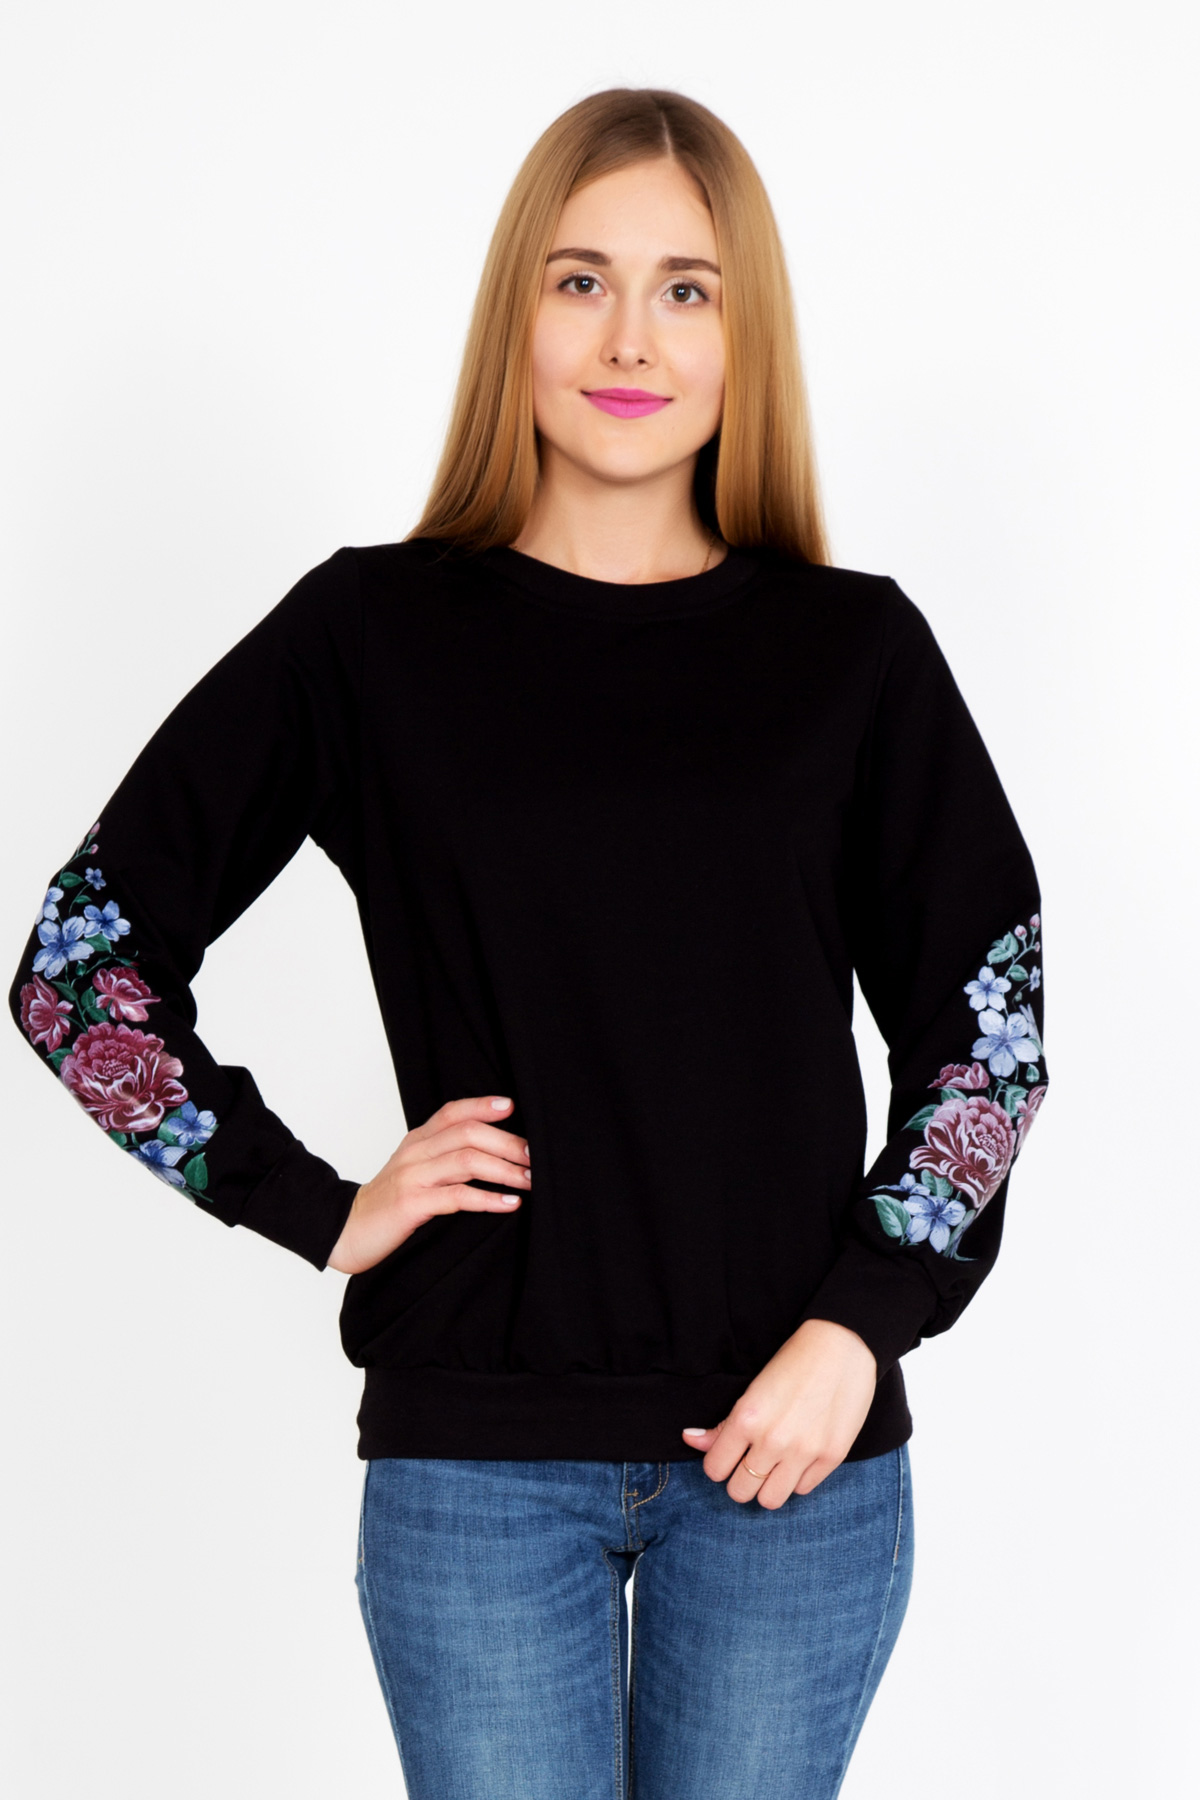 Жен. толстовка  Роза  р. 52 - Женская одежда артикул: 33226